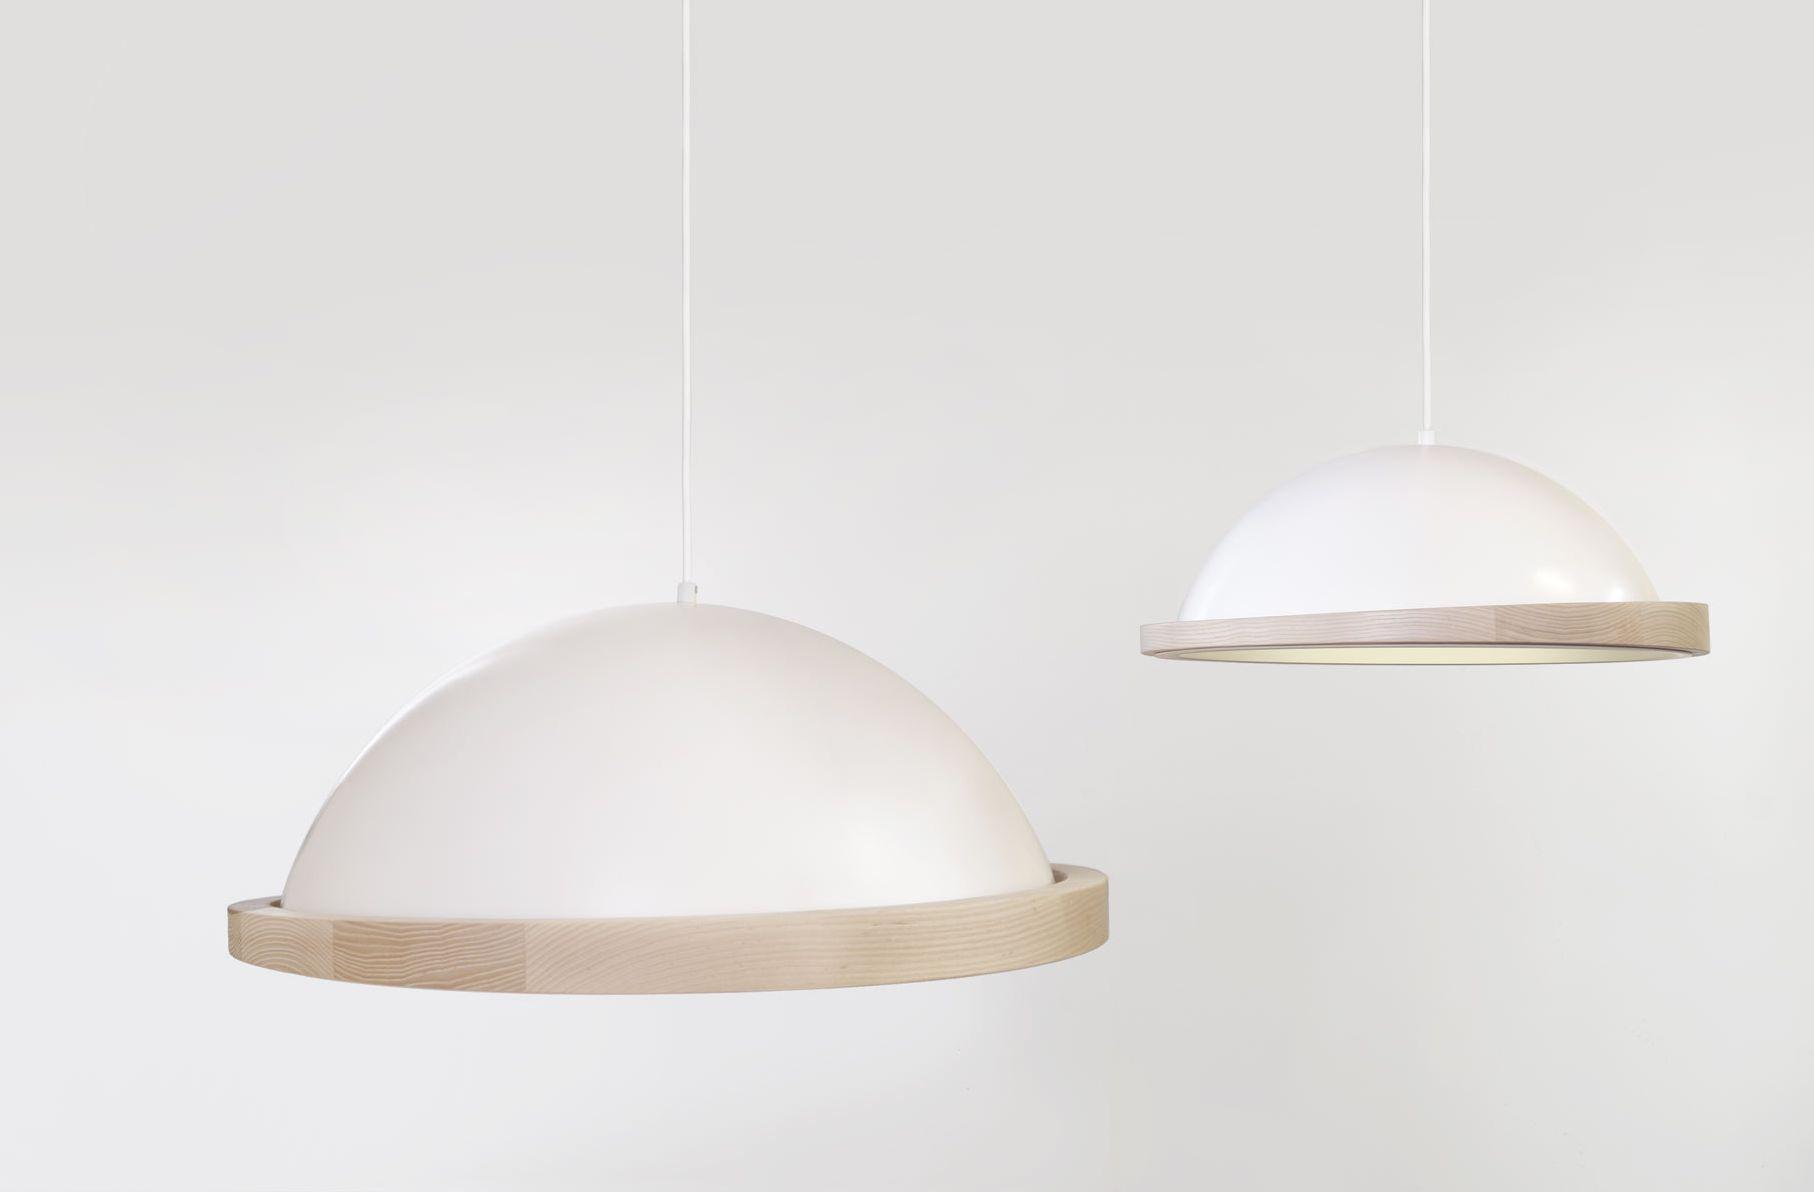 obelia 660mm pendant lights with ash rims